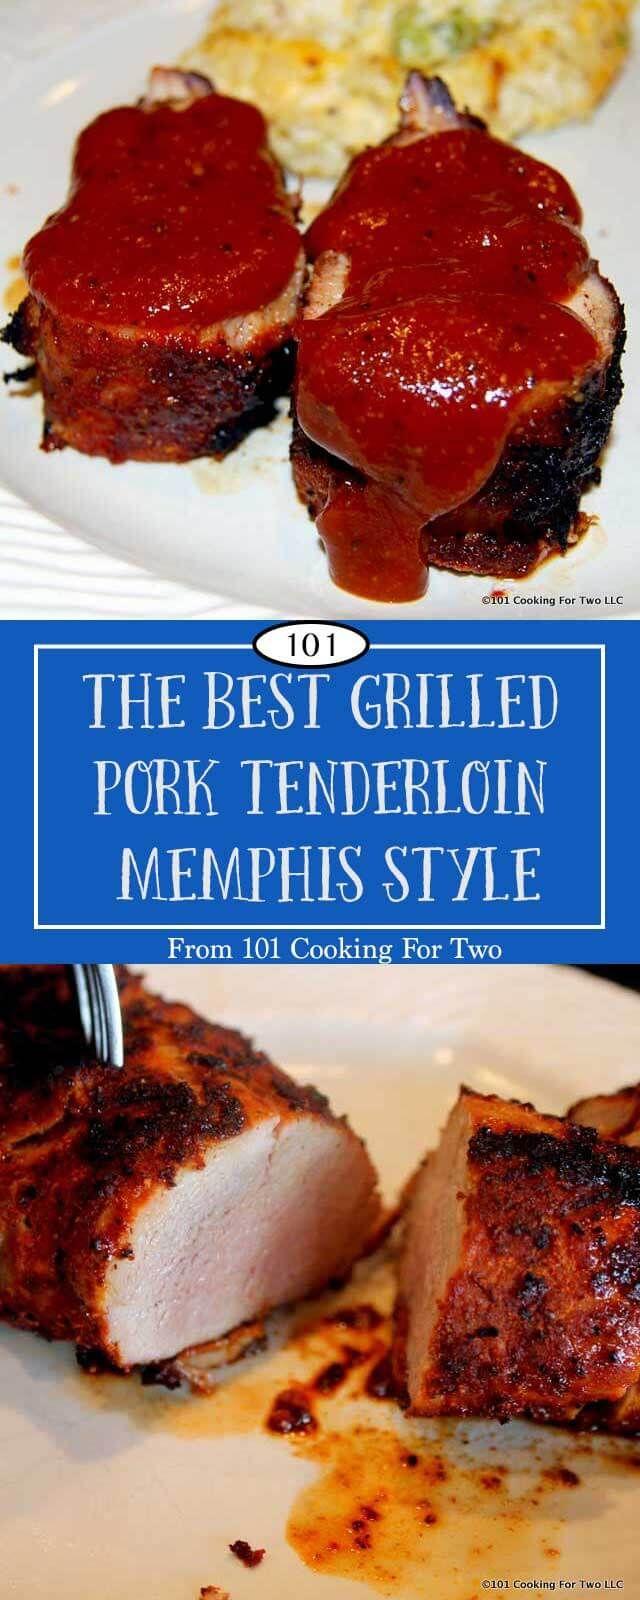 BBQ pork tenderloin at its absolute best. This is the best grill pork tenderloin… period.  Moist, tender and the most wonderful spicy taste.